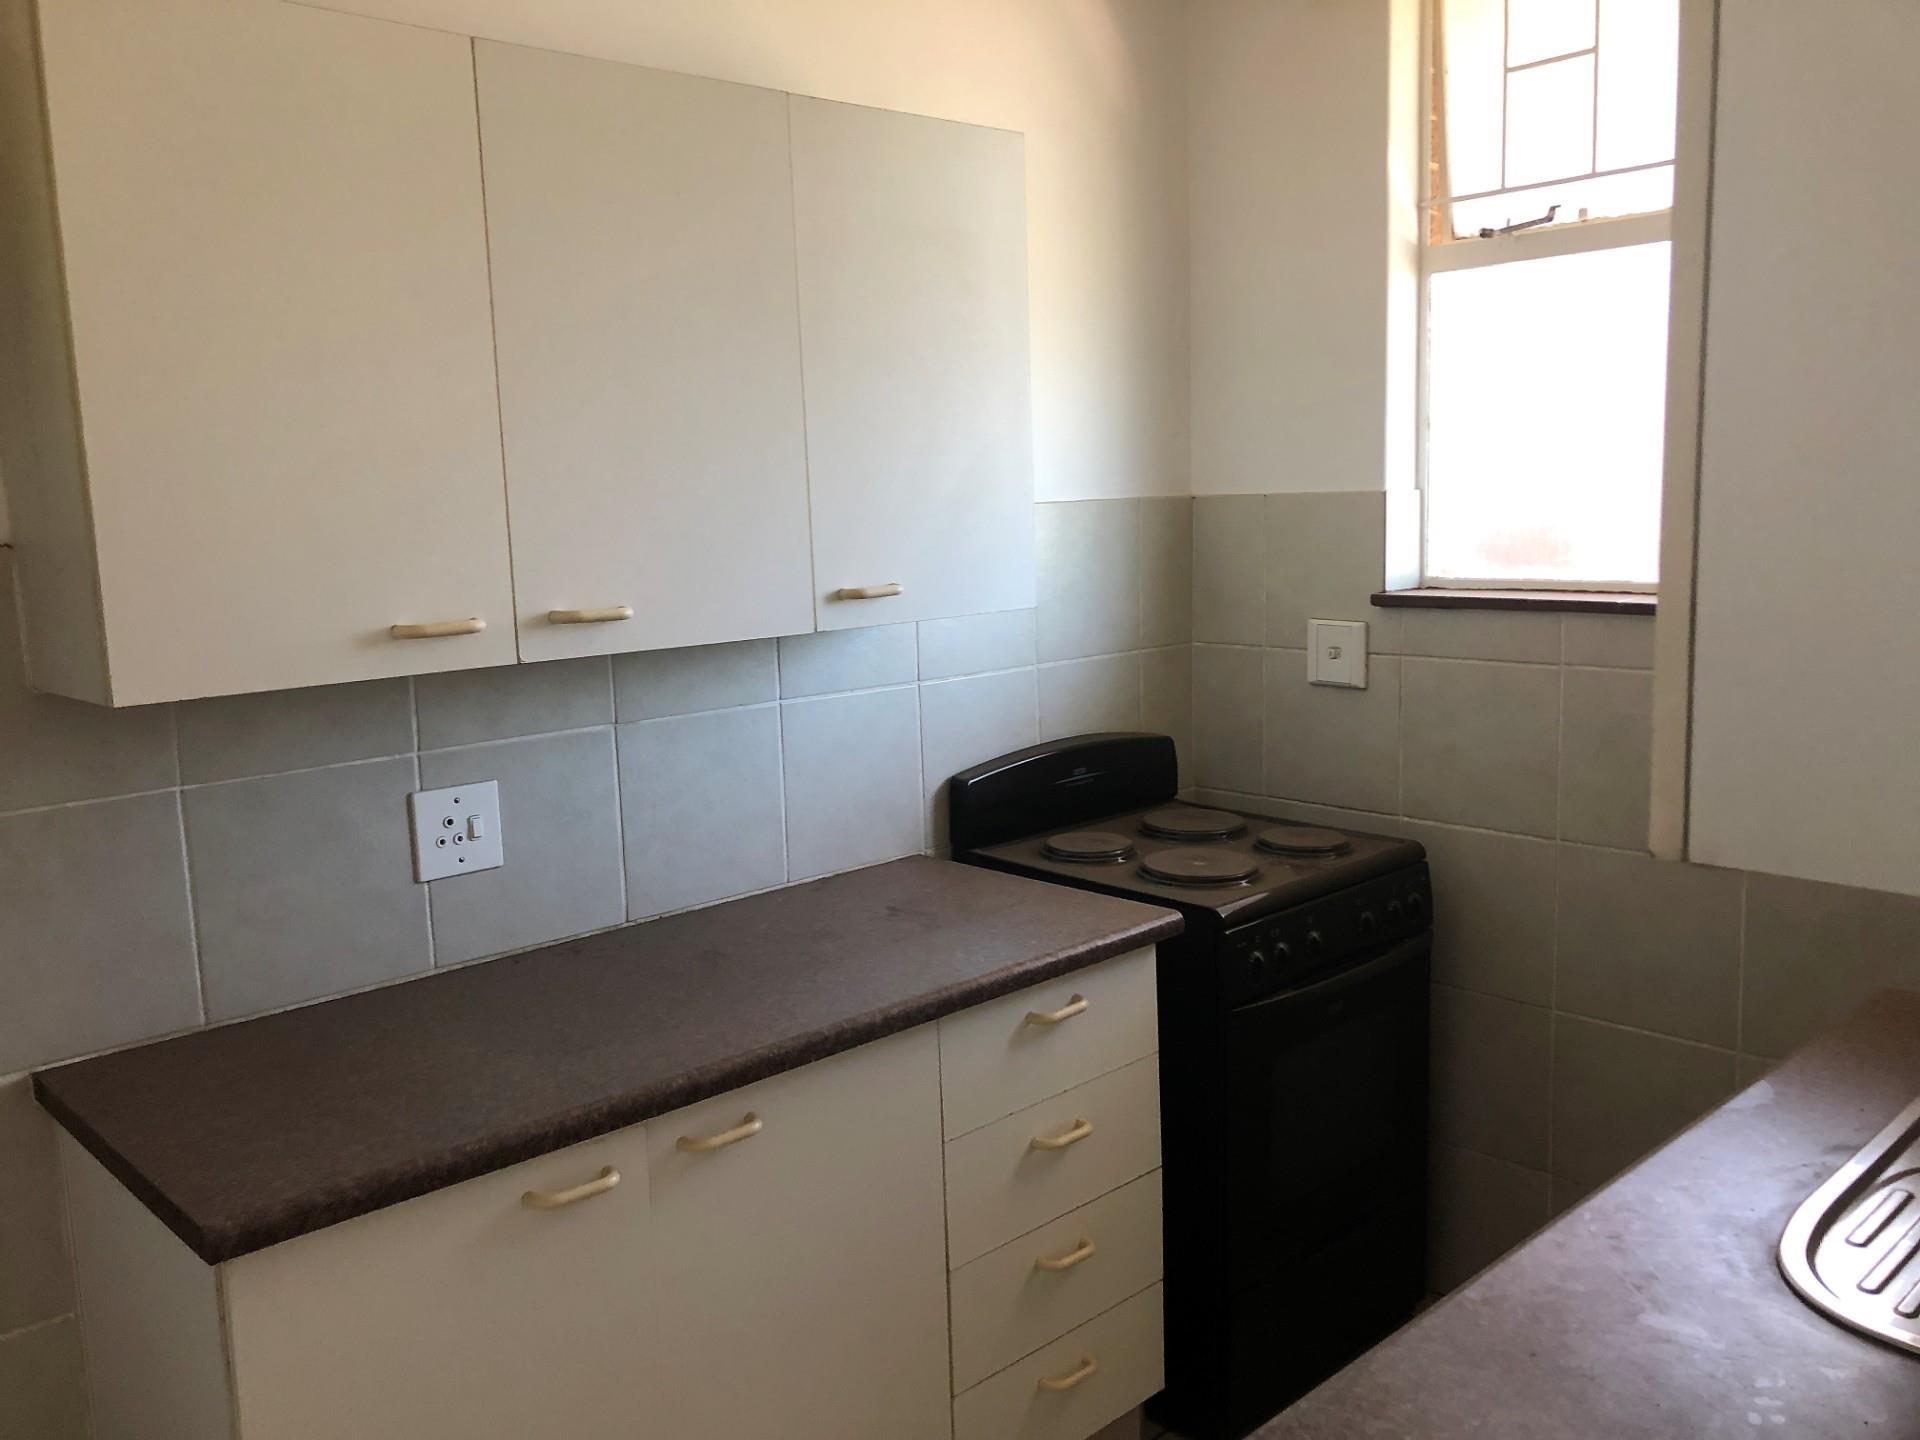 1.5 Bedroom Apartment For Sale in Weavind Park